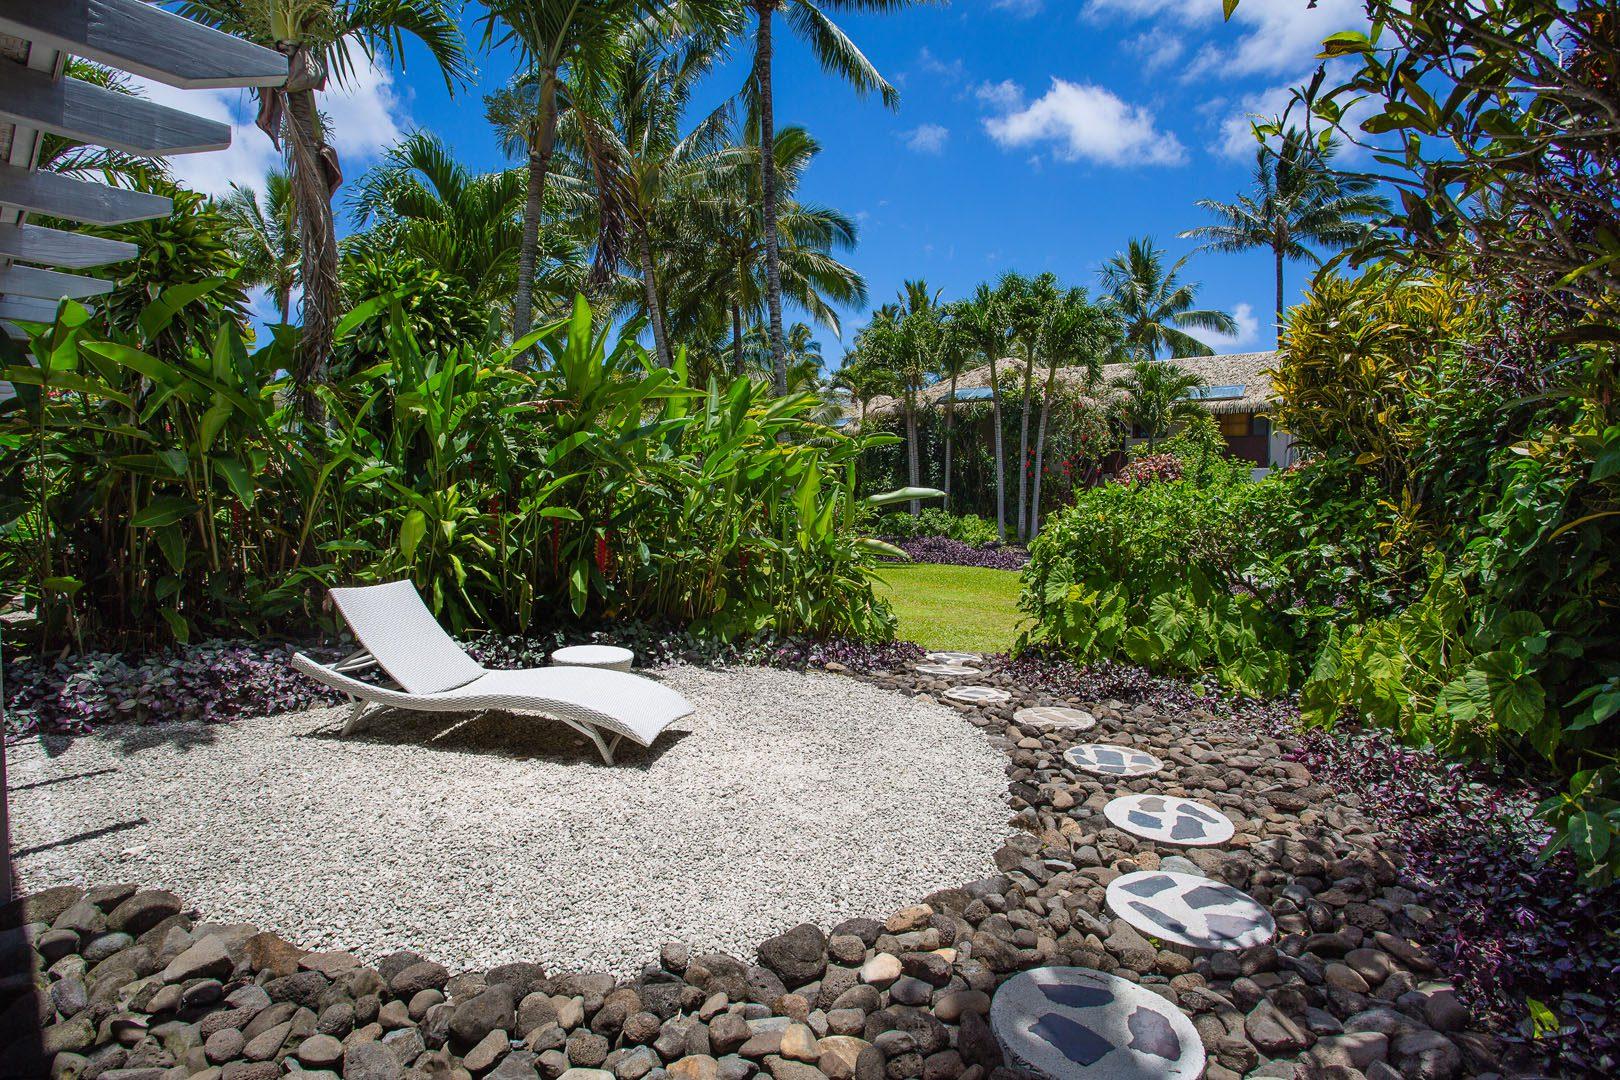 Premium Garden Villa showcasing the beautifully arranged pebble yard and the lush garden